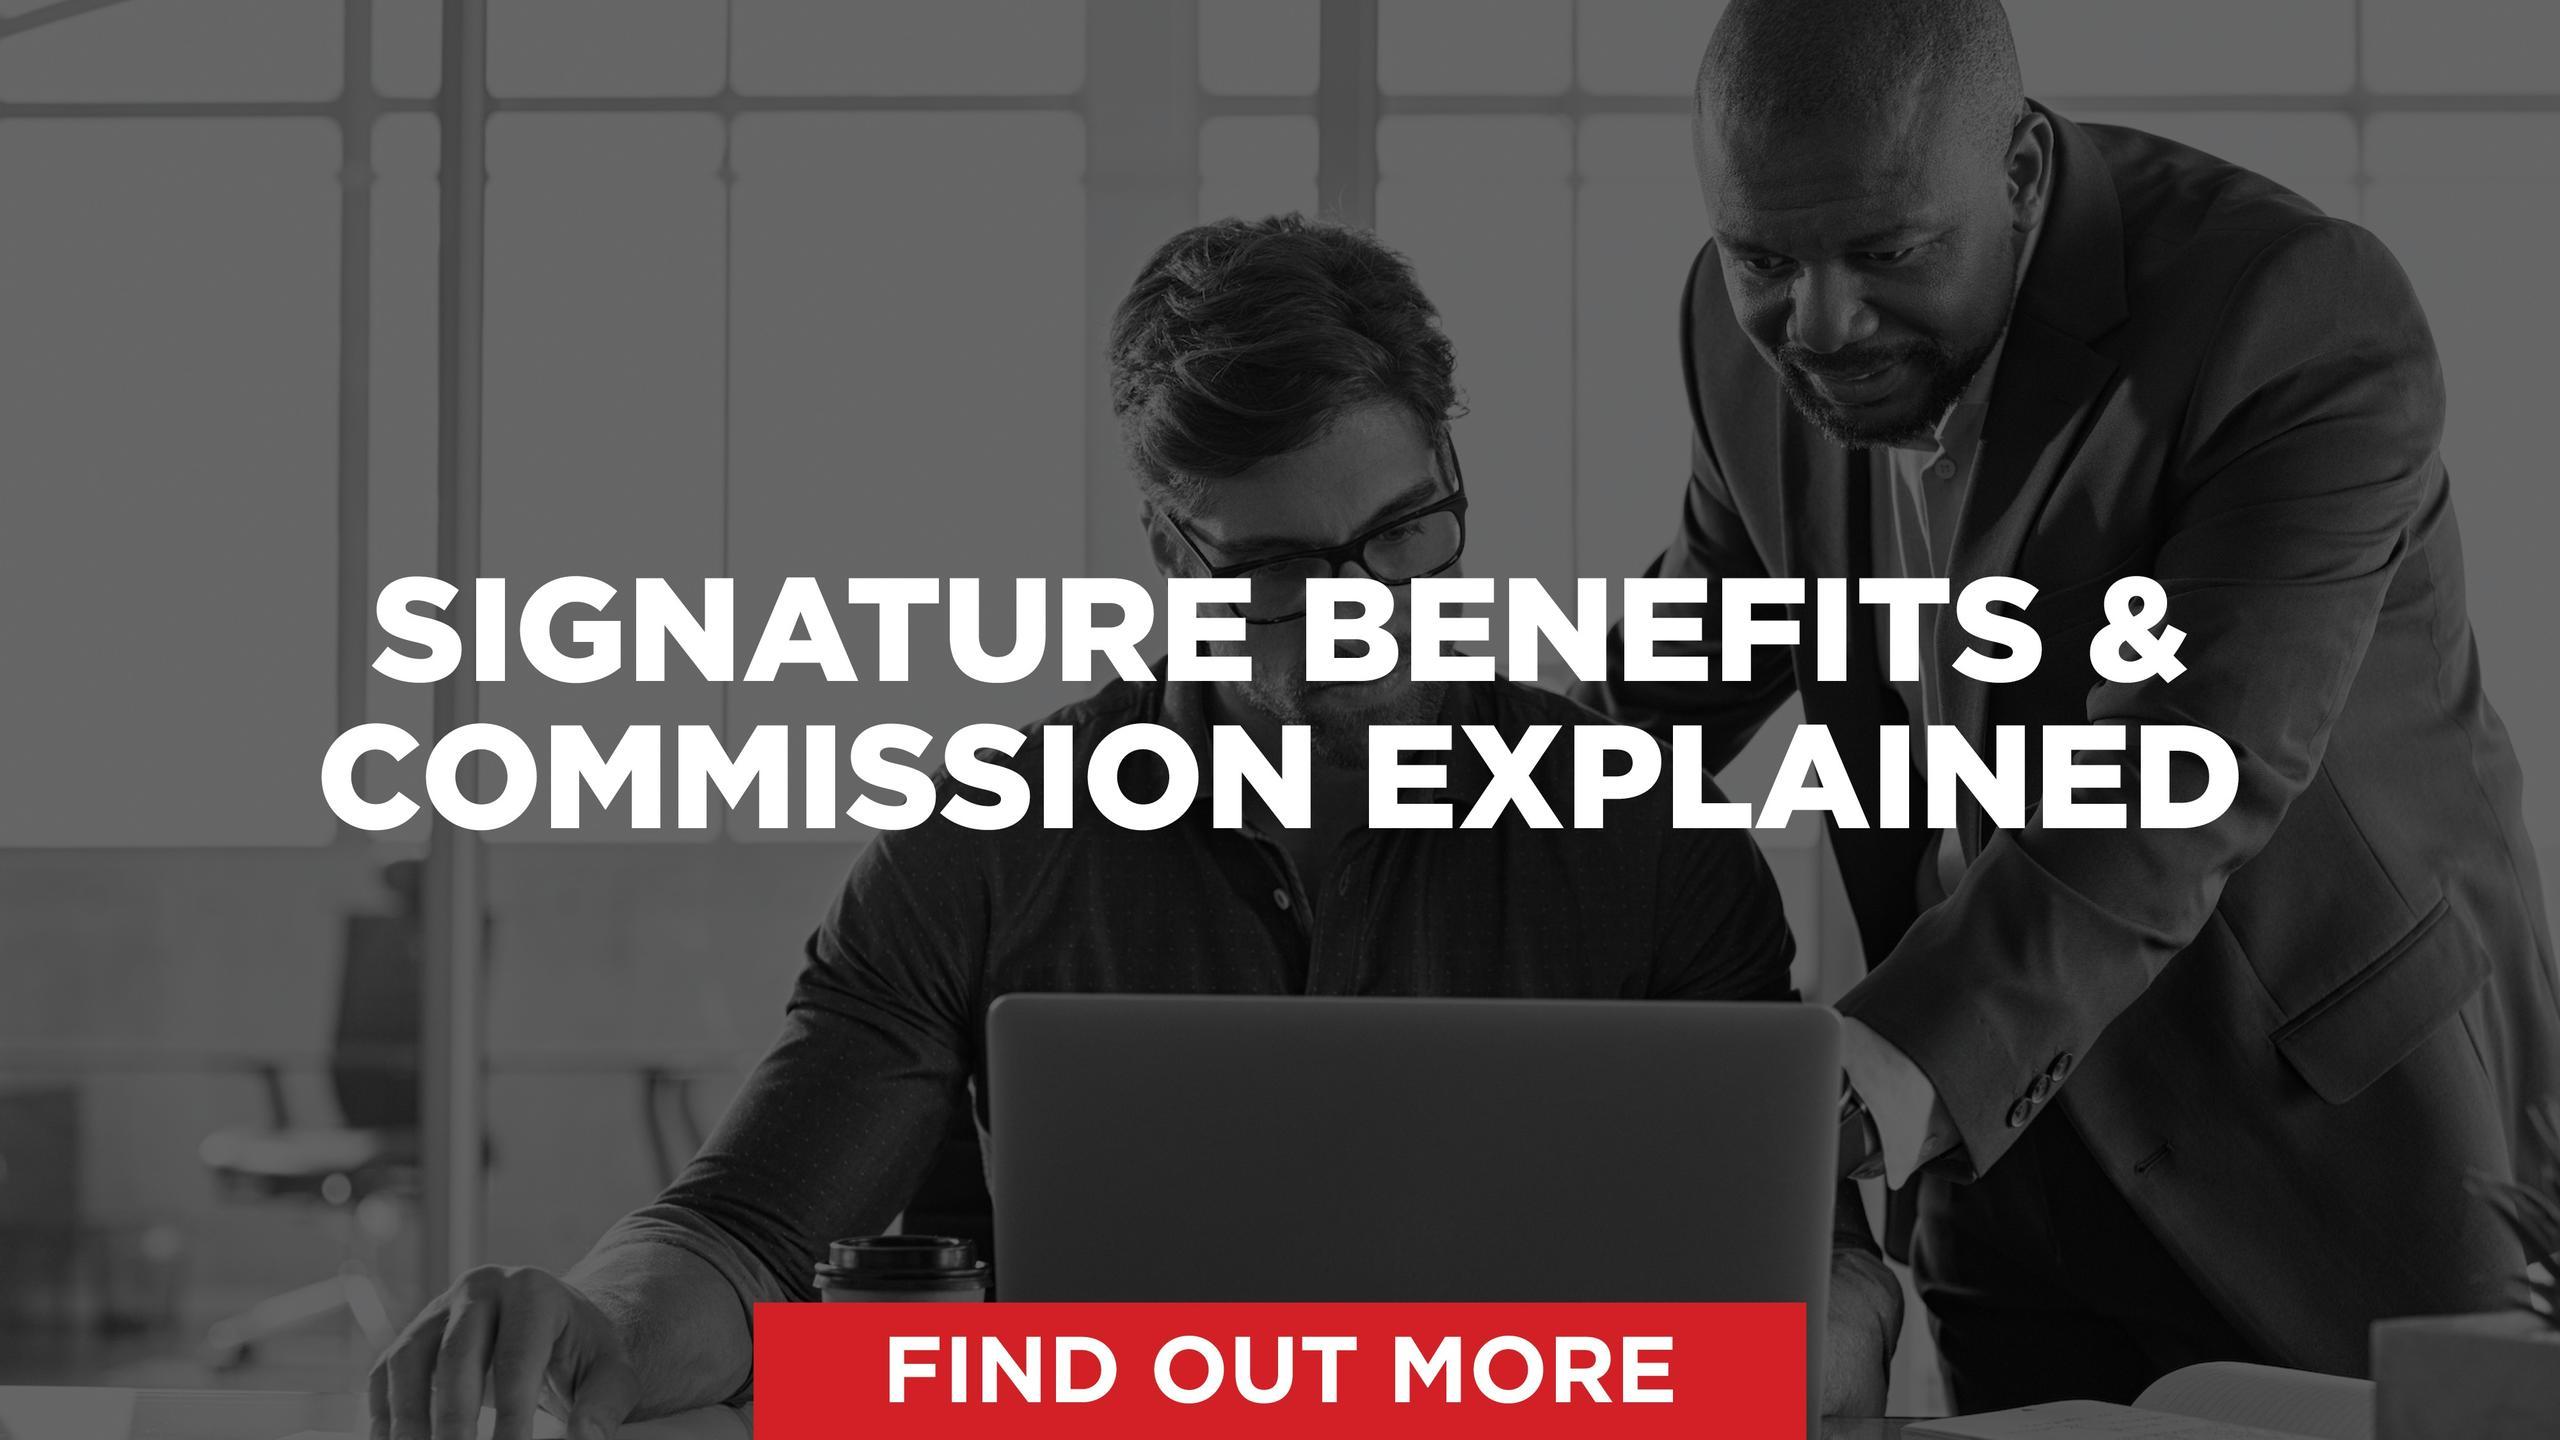 Signature Benefits & Commissions Explained